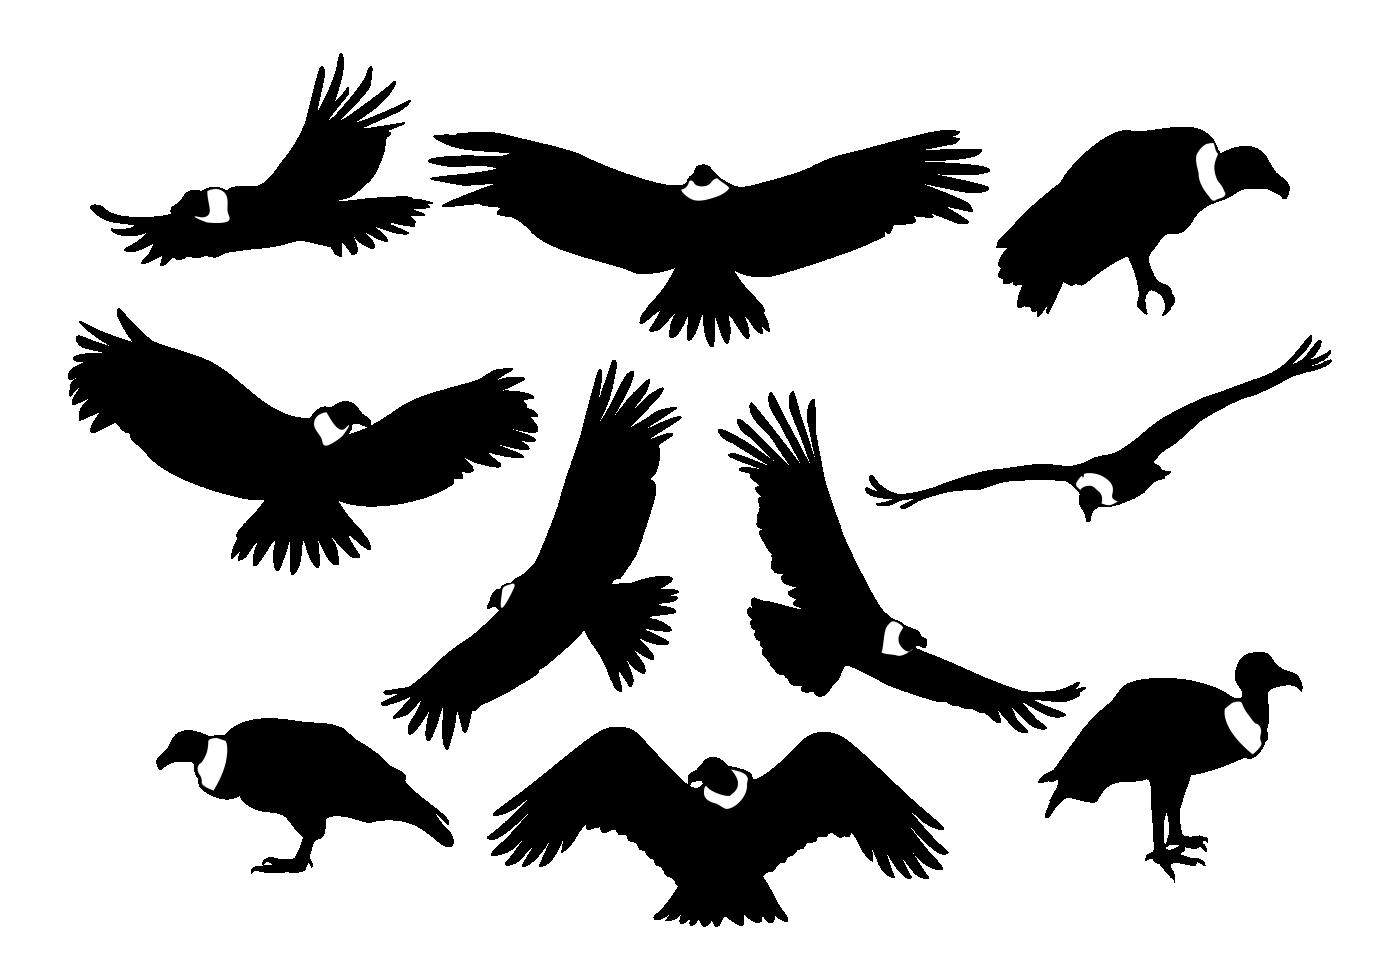 condor silhouettes vector download free vector art